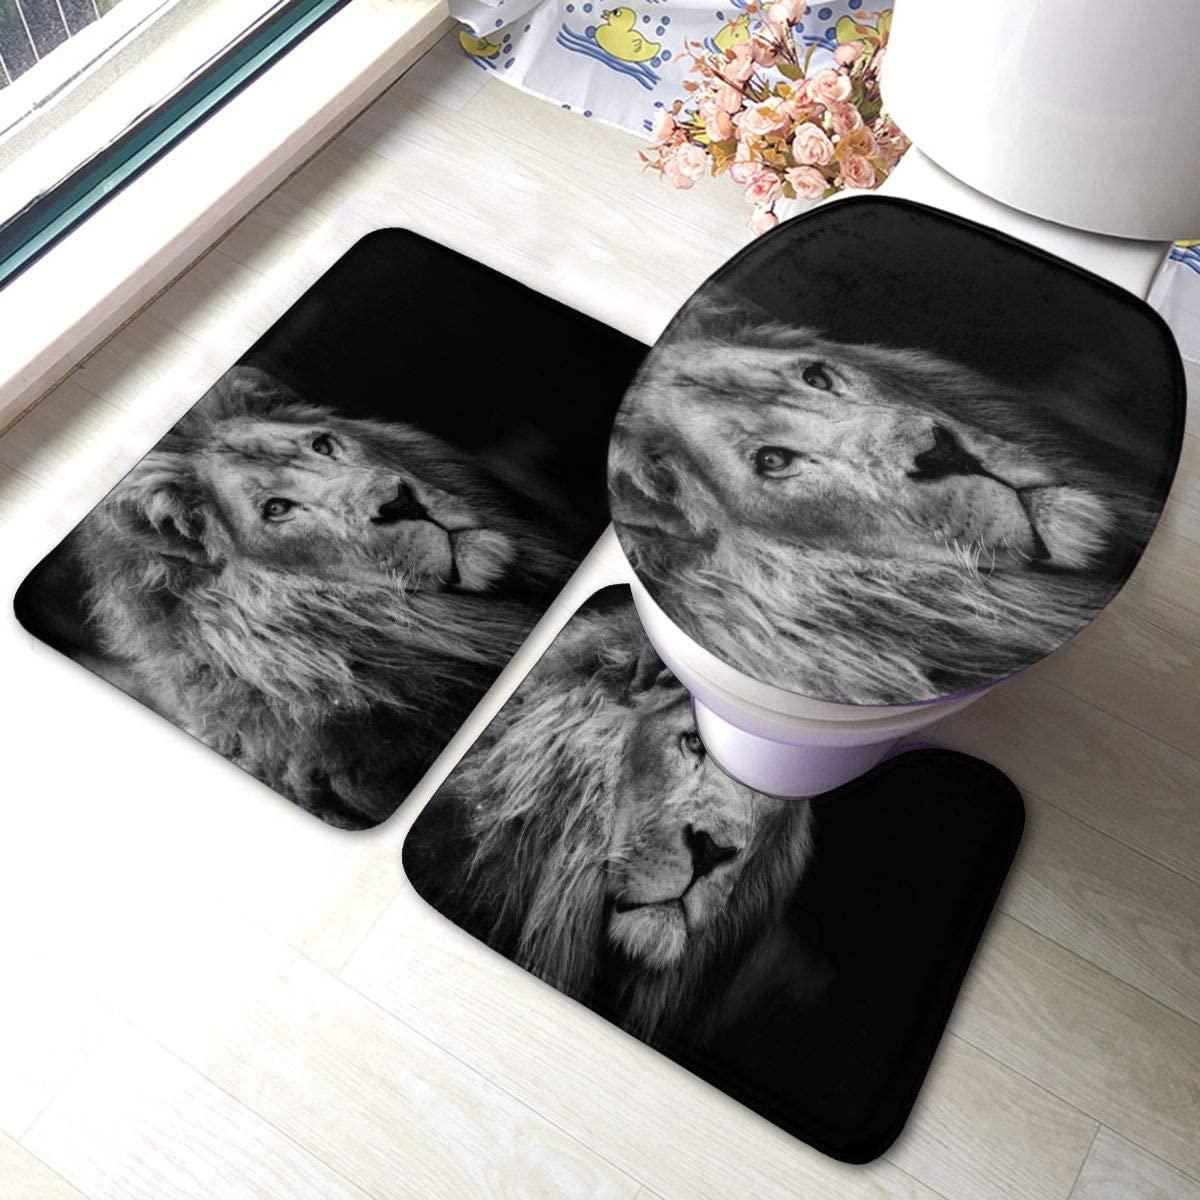 Bathroom Rugs Sets 3pc Special Portrait of Animal Lion Non Slip Bath Mats Rug U Shaped Contour Rug Toilet Lid Cover Mat Washable Floor Carpet Shower Tub Bathroom Accessories Decor